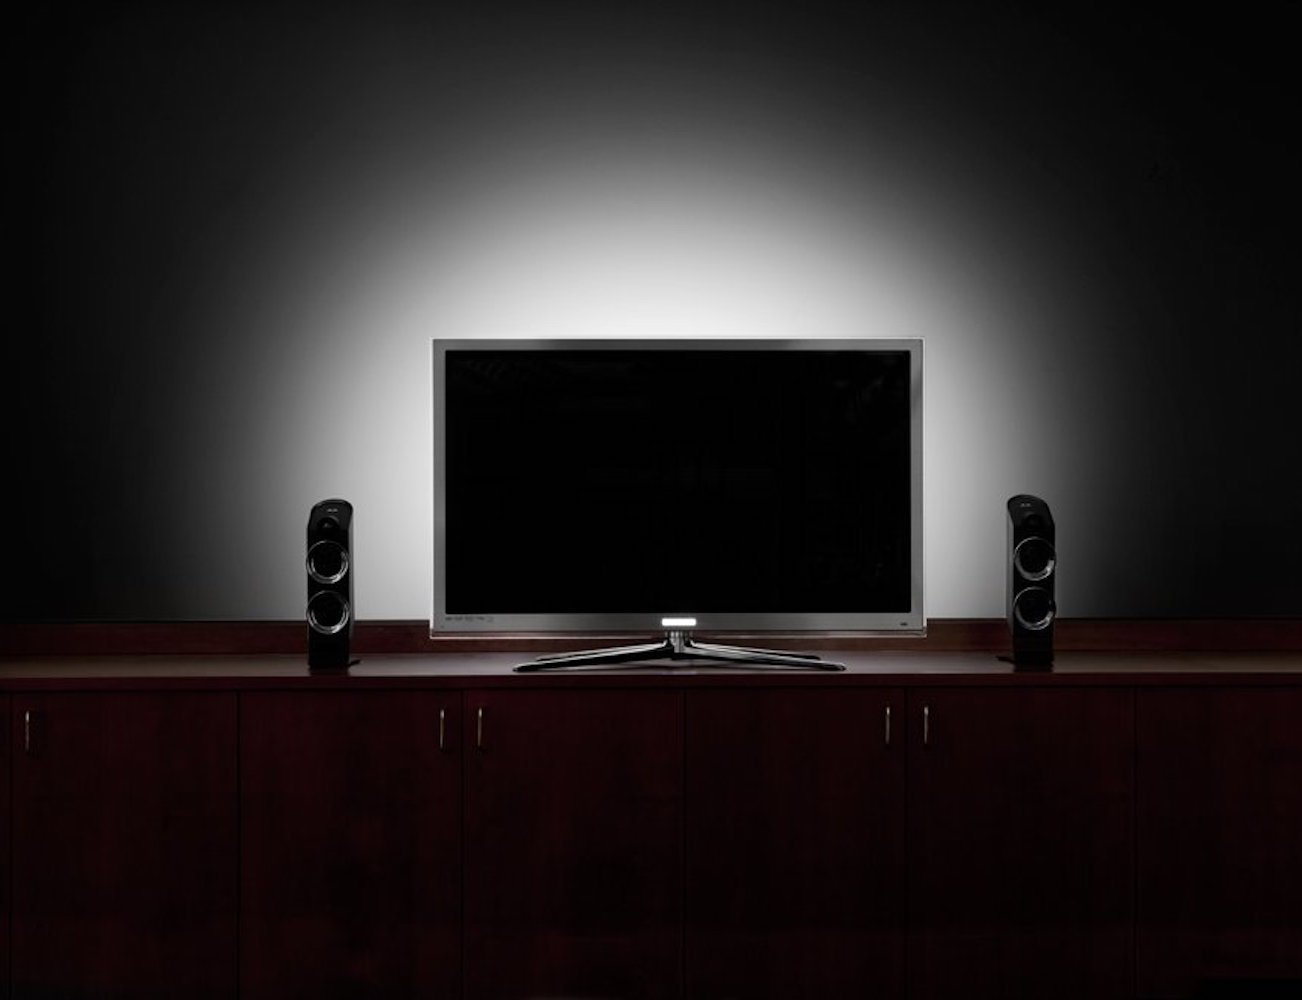 Antec+USB+Powered+HDTV+Bias+Lighting